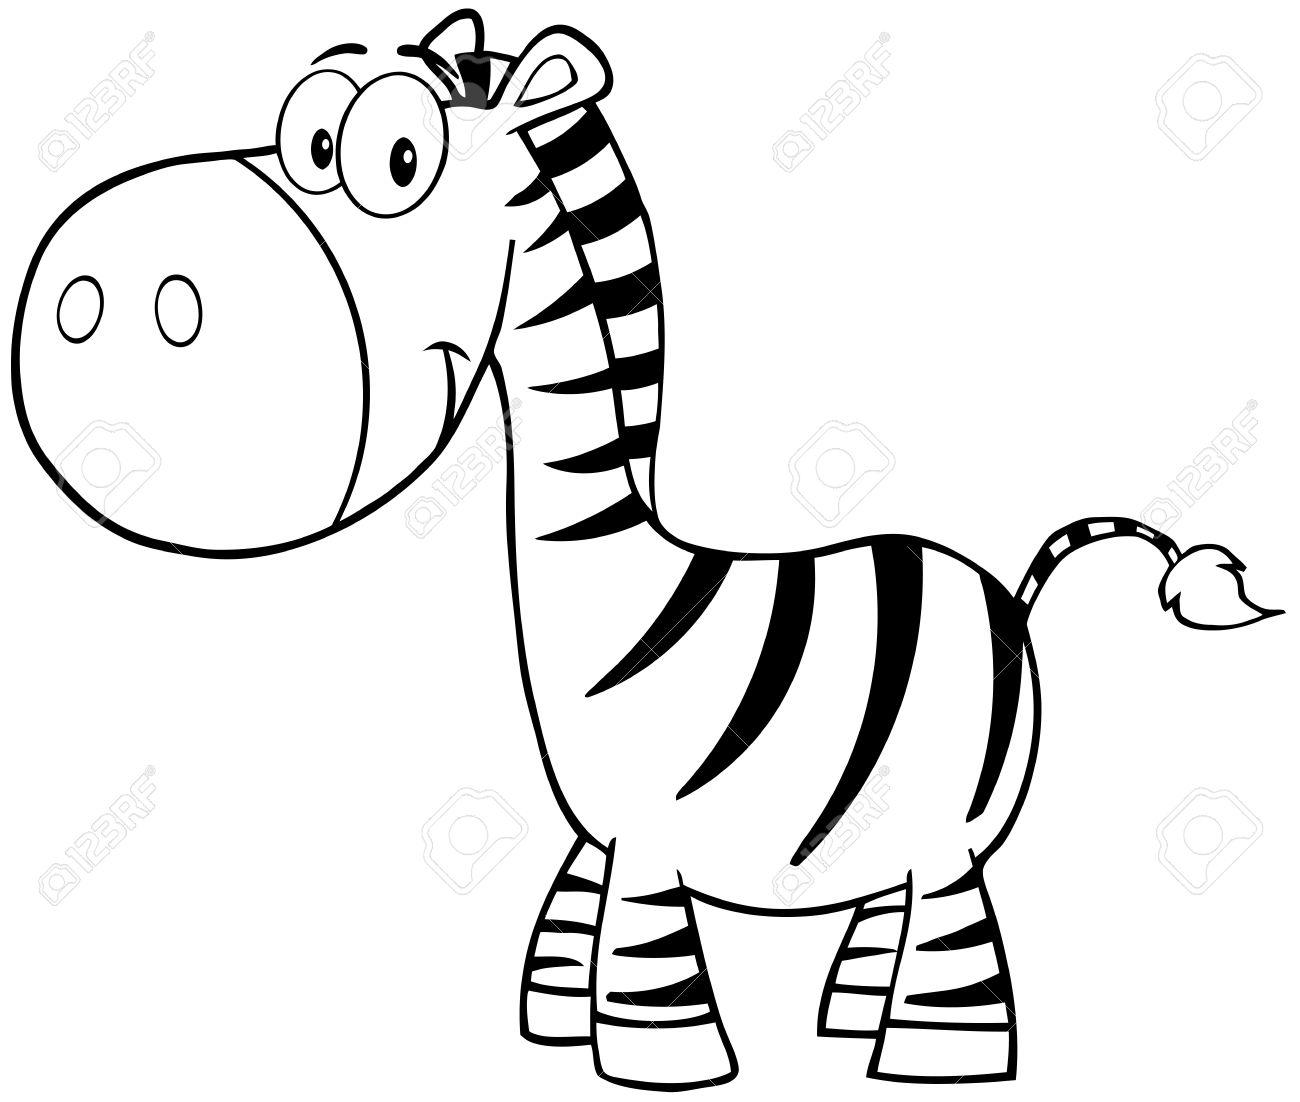 Animated Zebra Cliparts